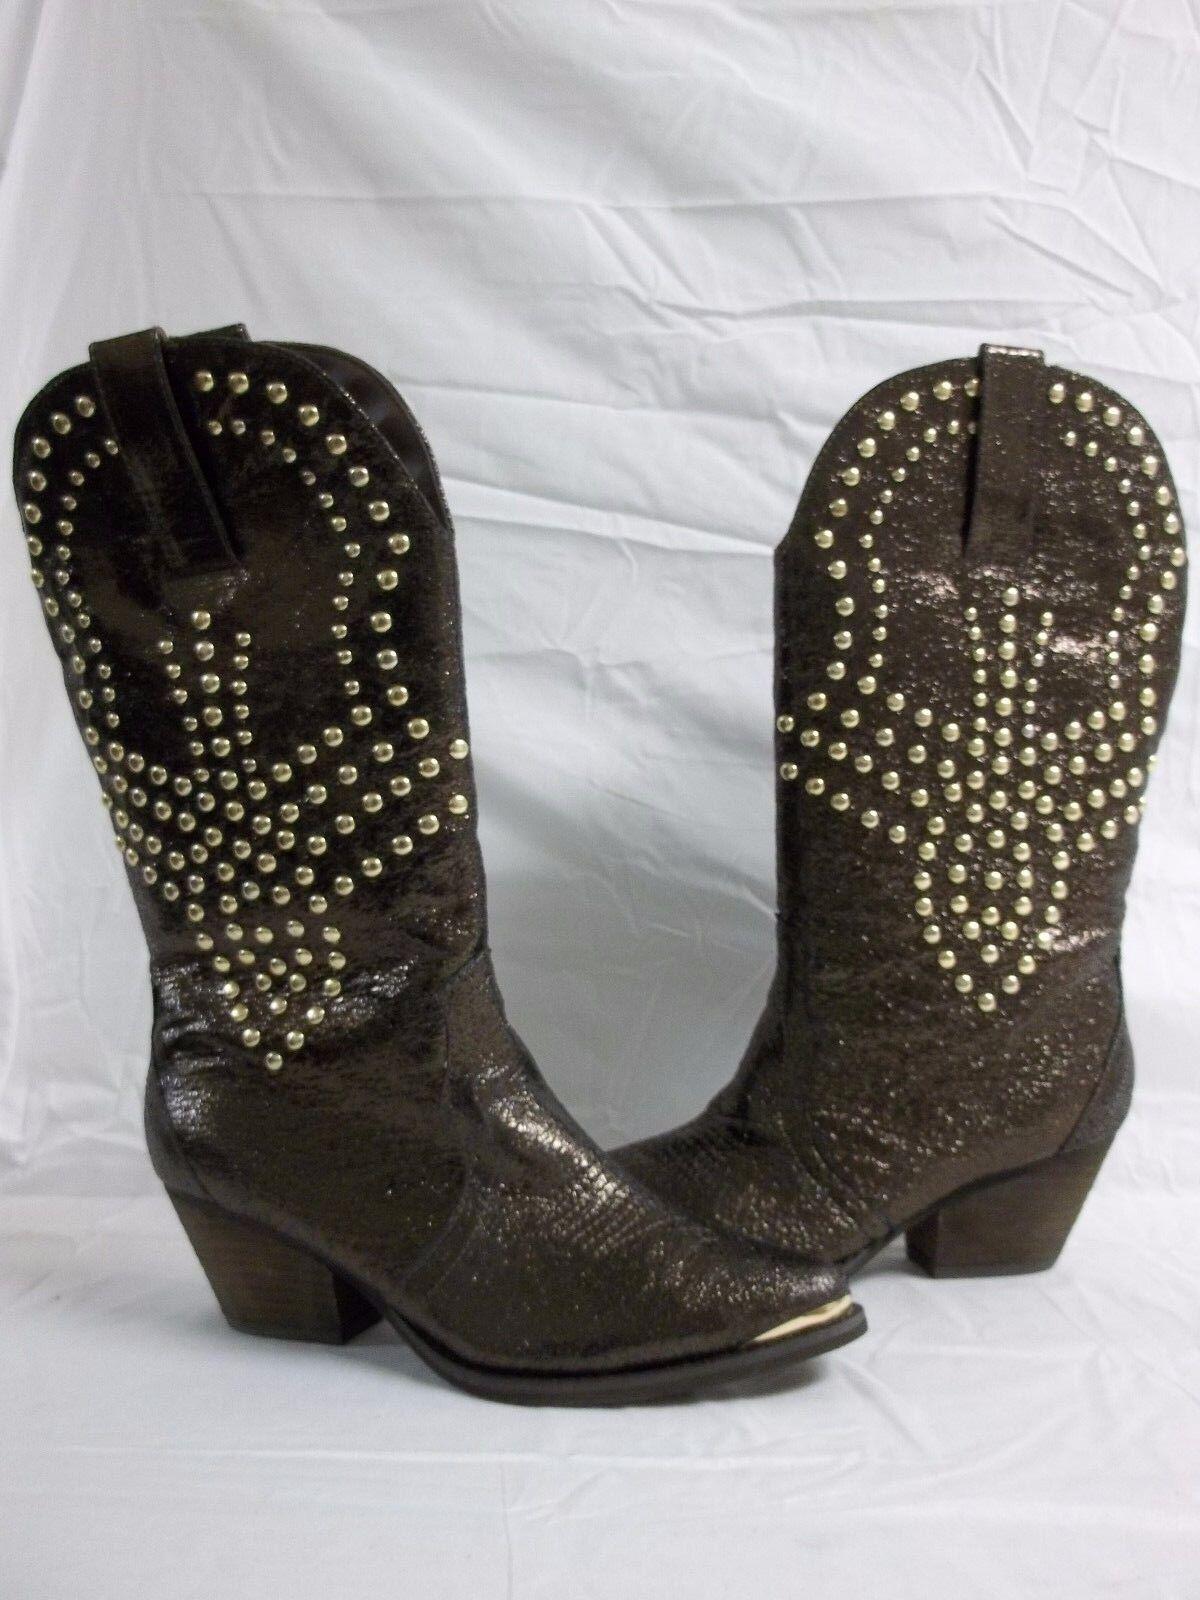 Reba Größe 8.5 M Biker Braun Leder Mid Calf Cowboy Stiefel NEU Damenschuhe Schuhes NWOB